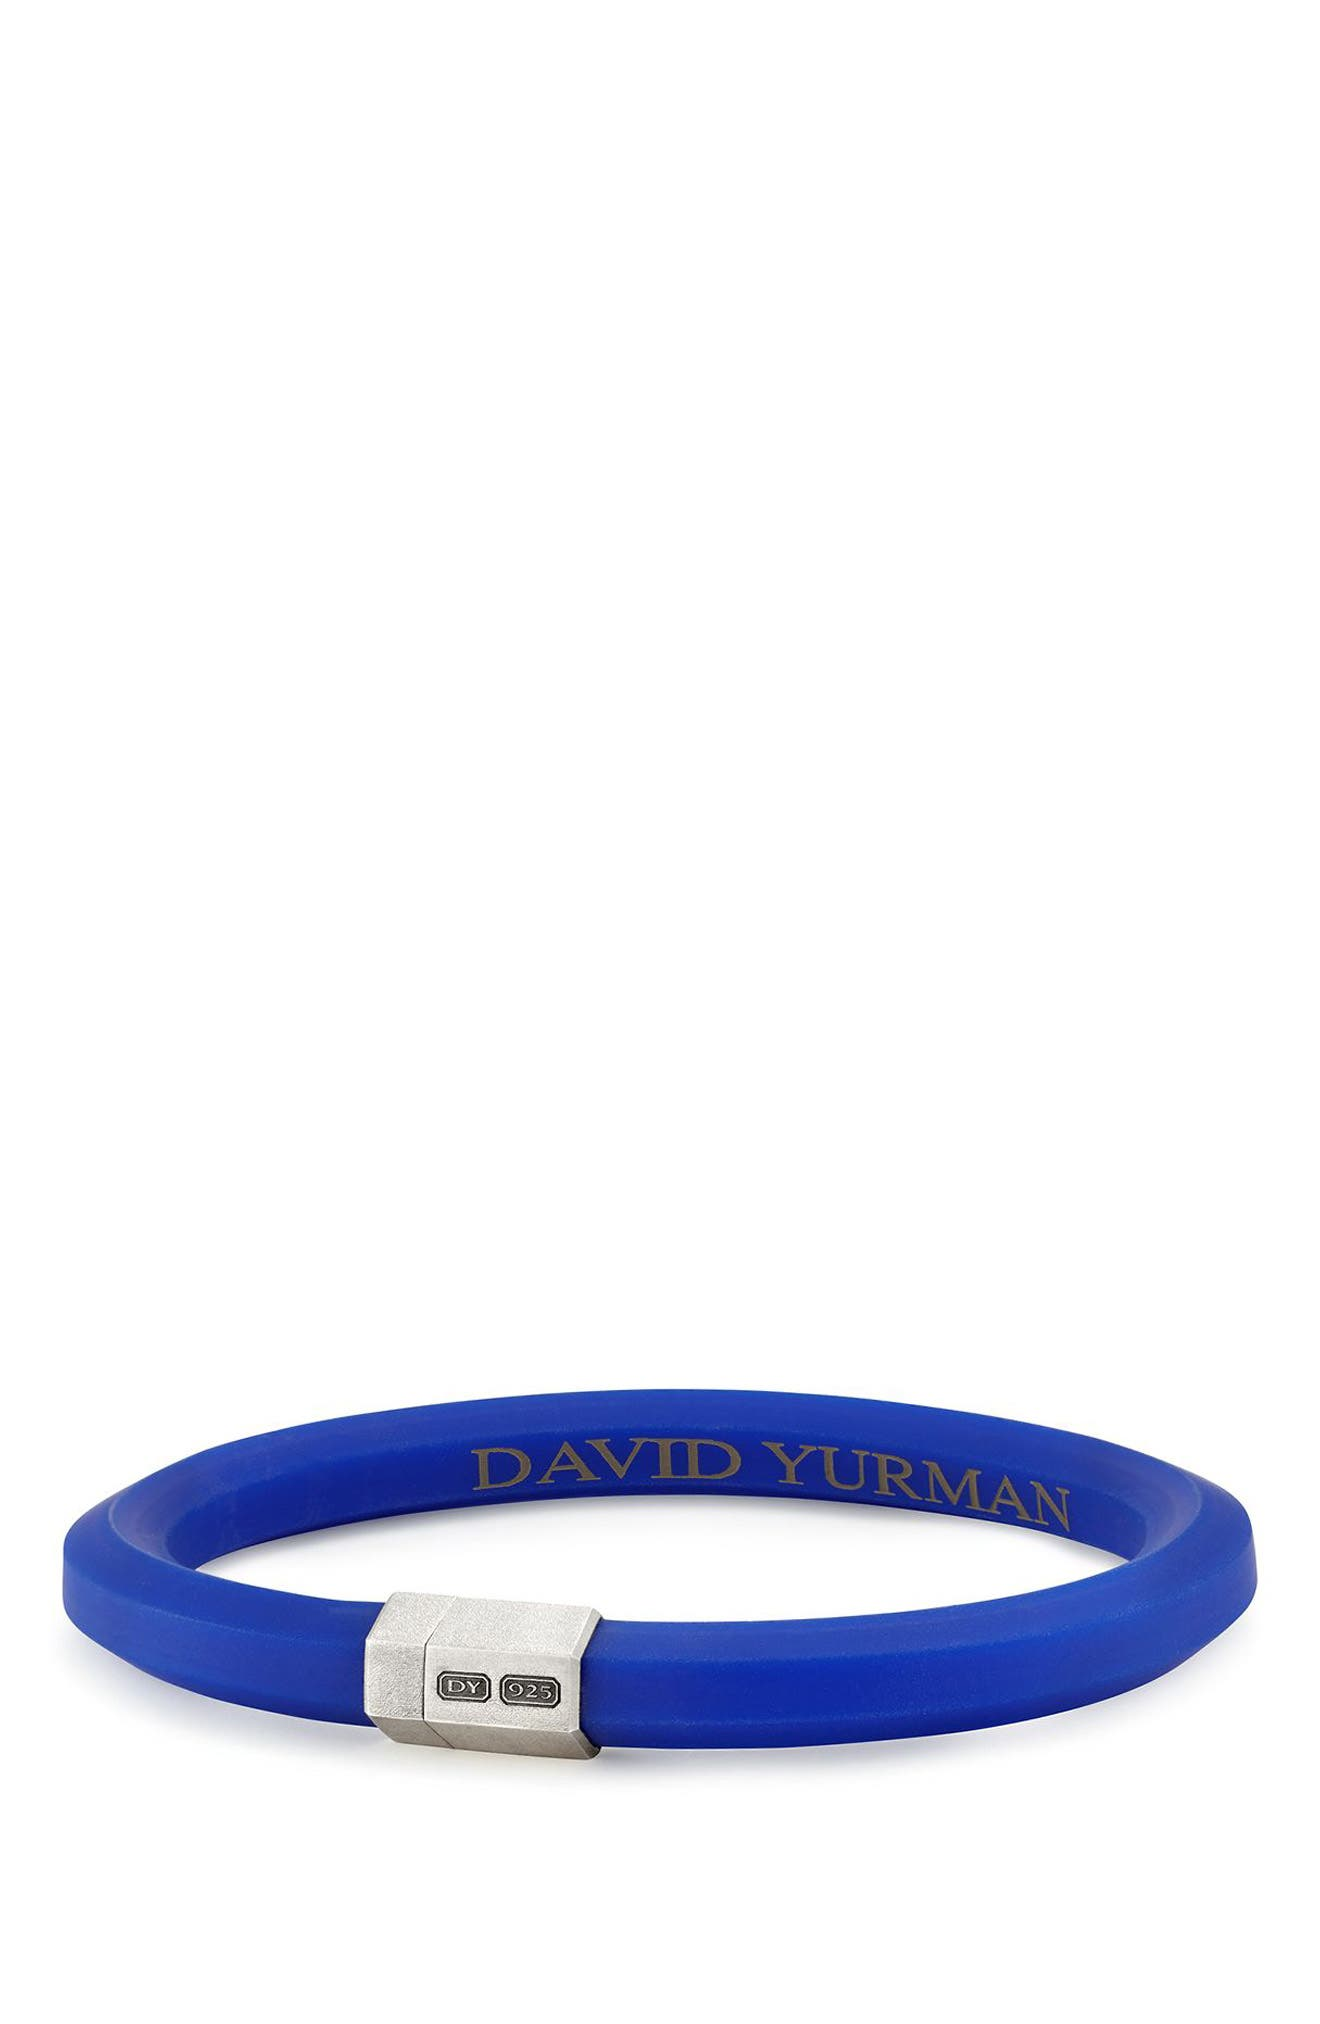 Streamline Rubber ID Bracelet in Black,                         Main,                         color, Blue